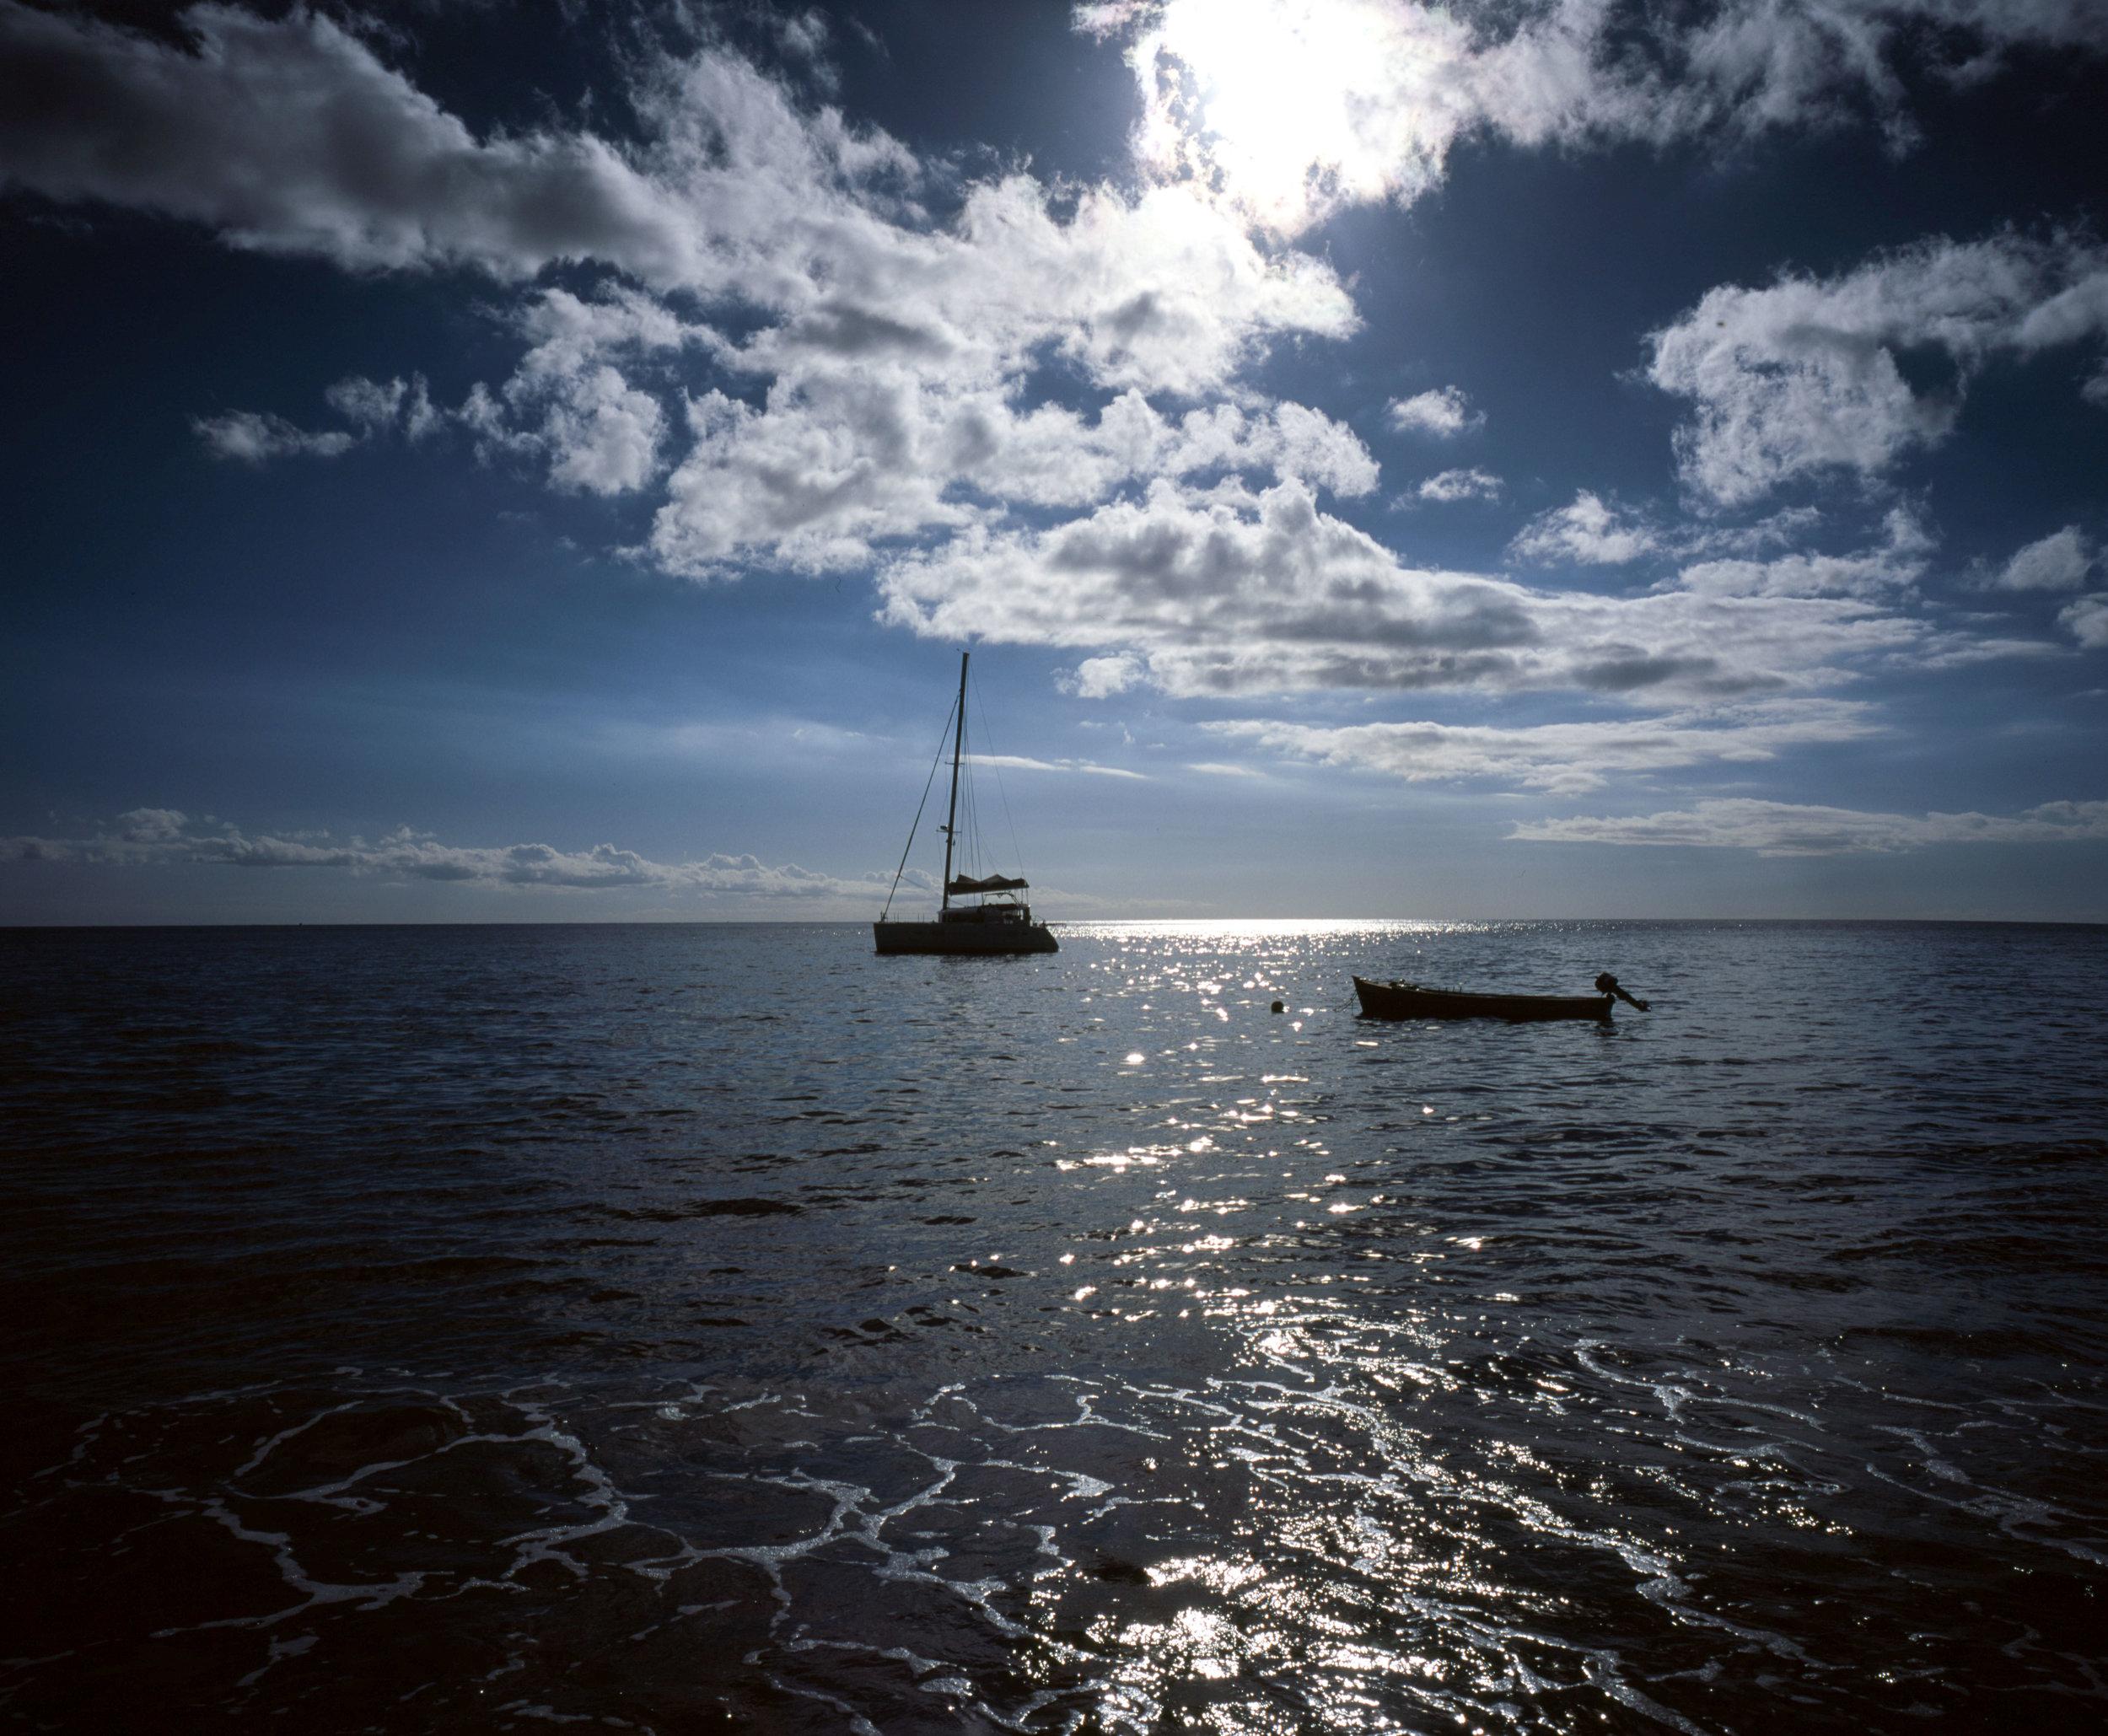 Beach Boats Fuji GF670w | Fuji Provia 100f